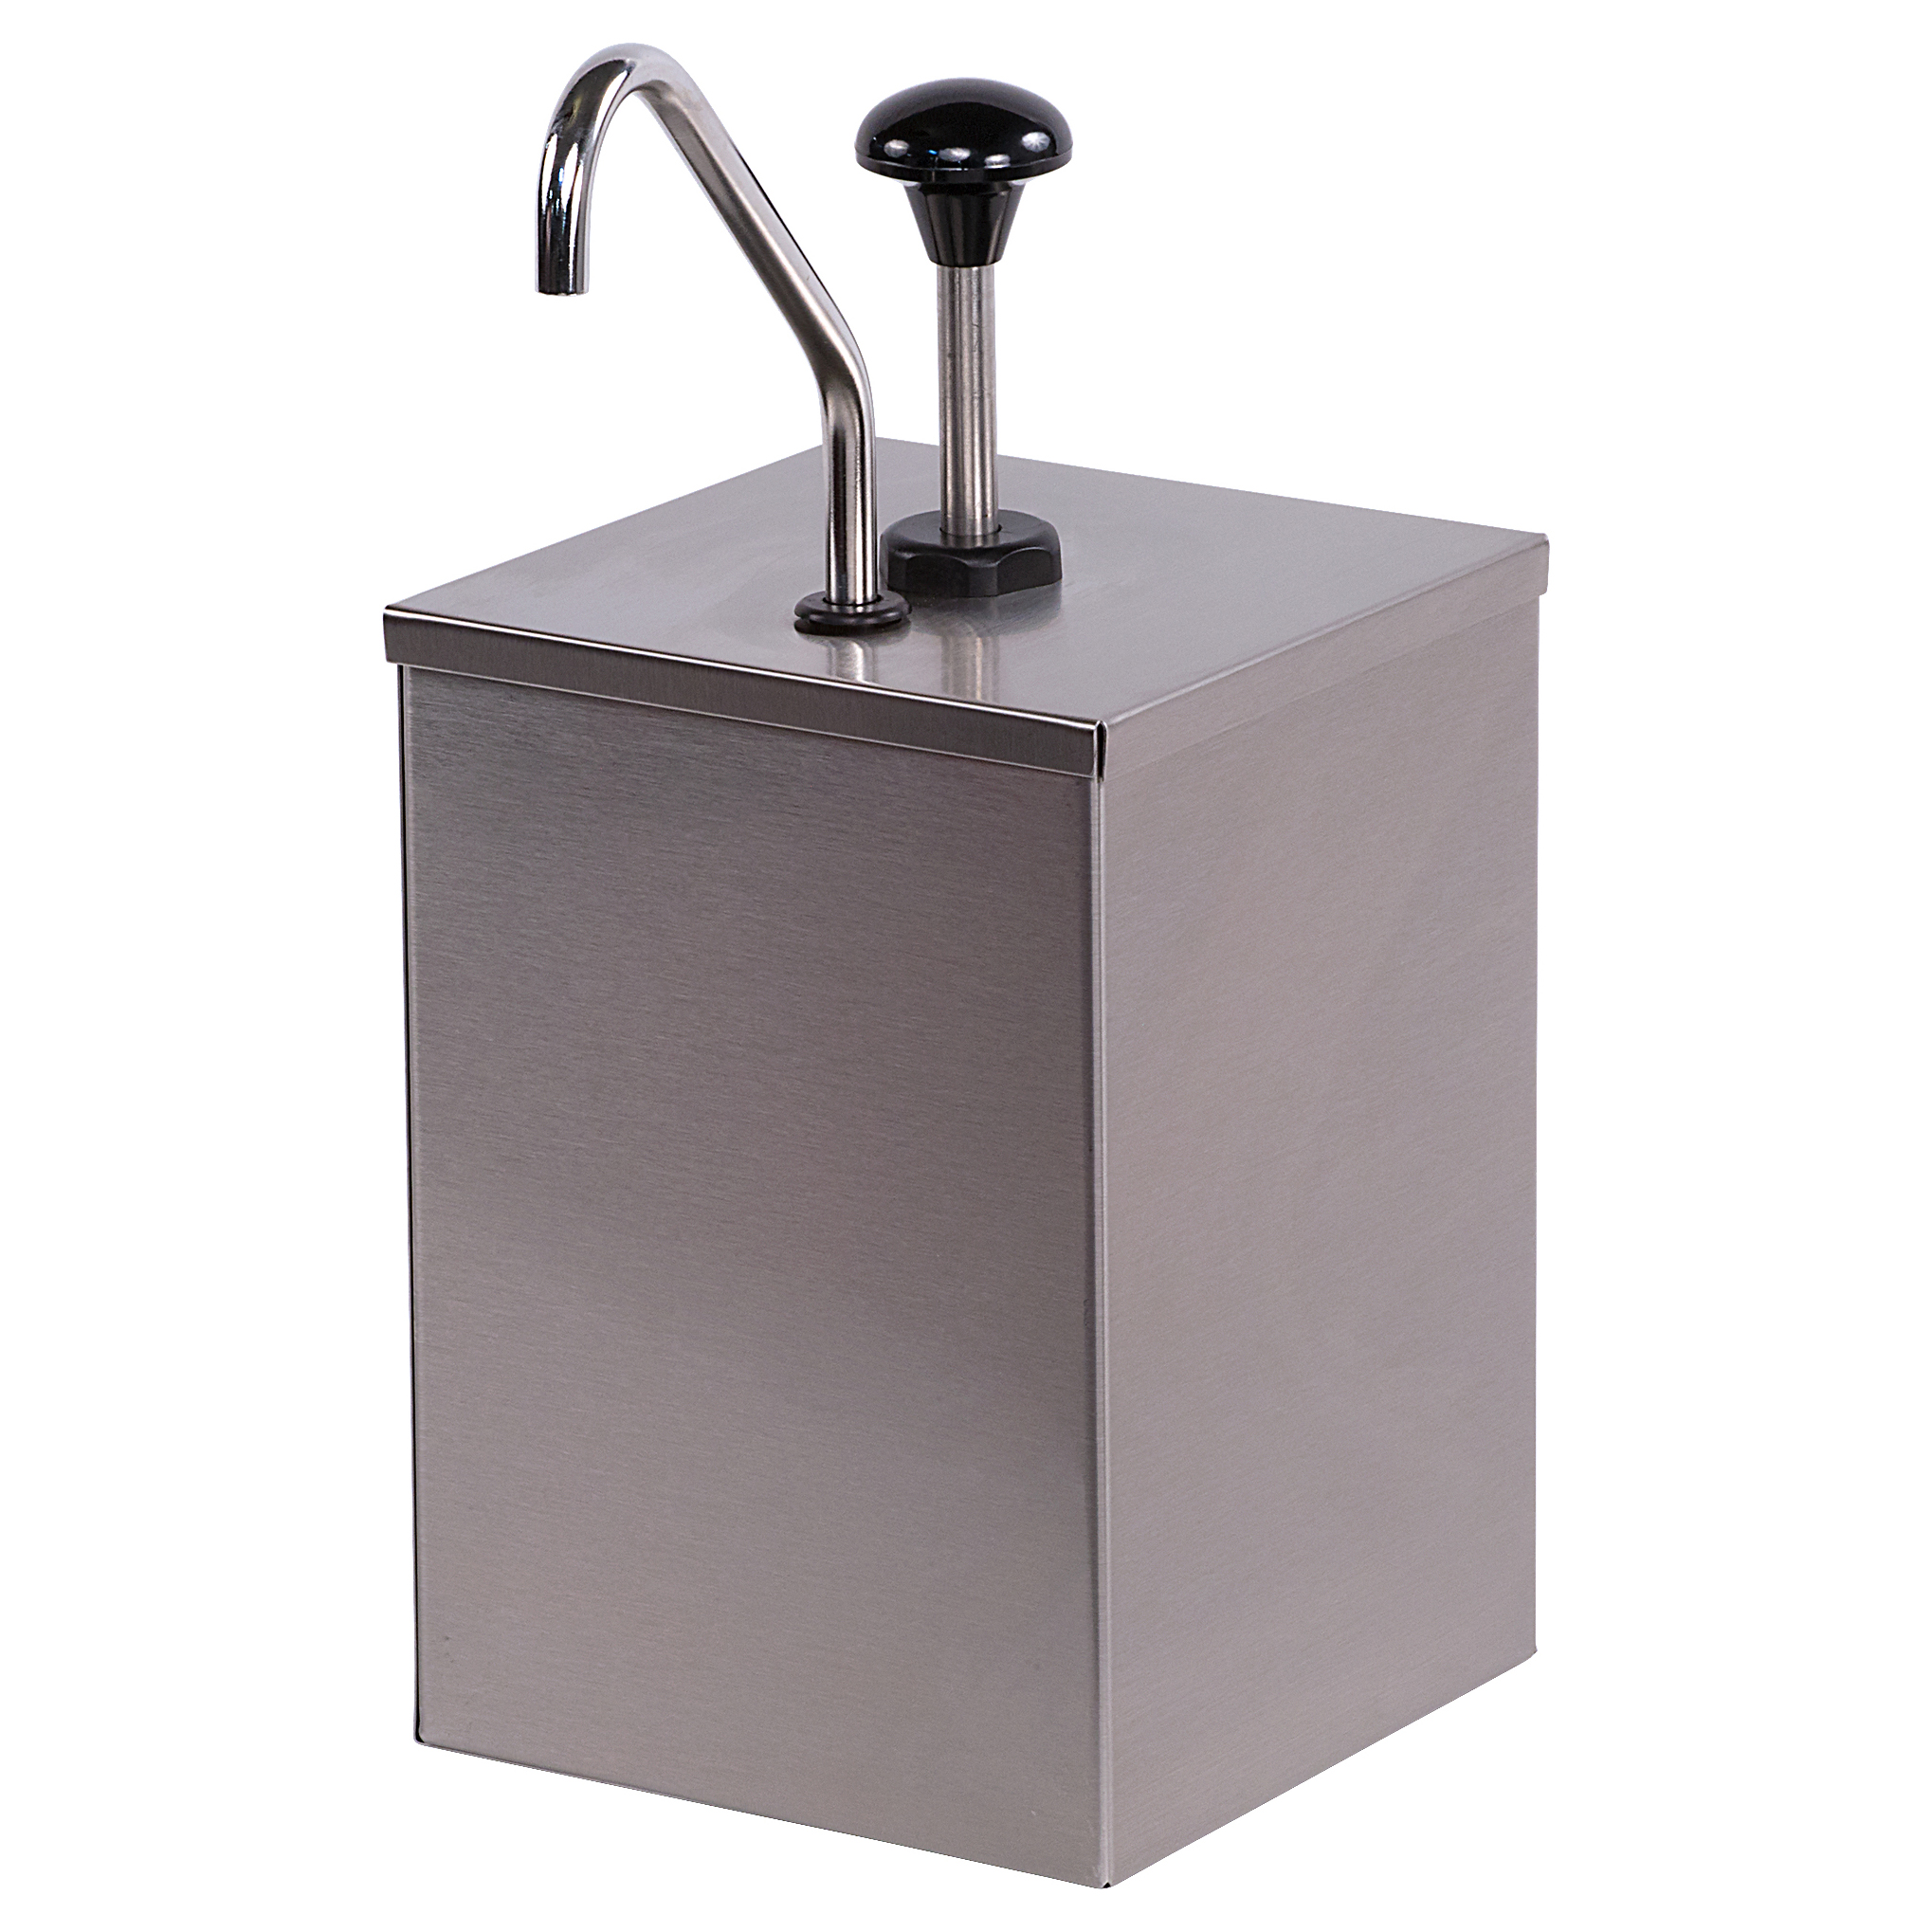 Carlisle 386010 condiment dispenser pump-style